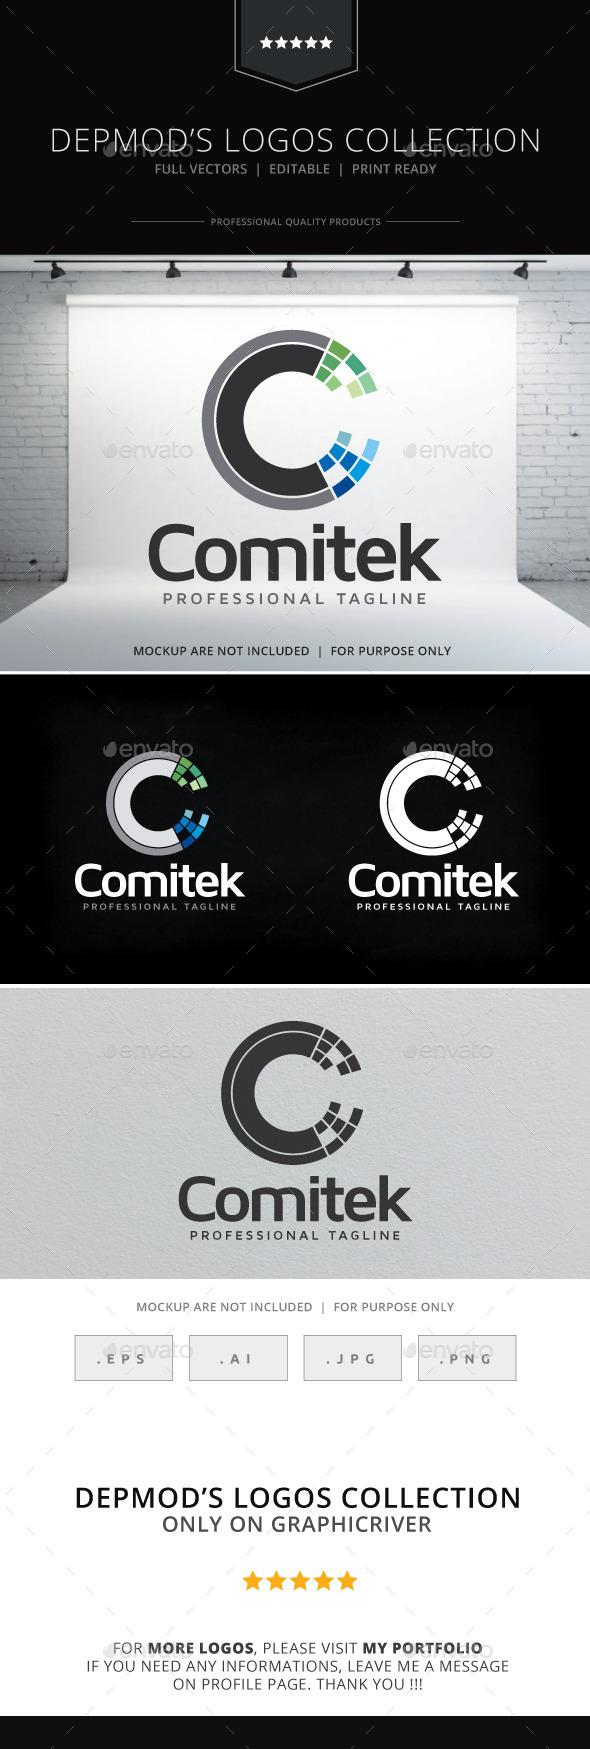 GraphicRiver Comitek Logo 9355273